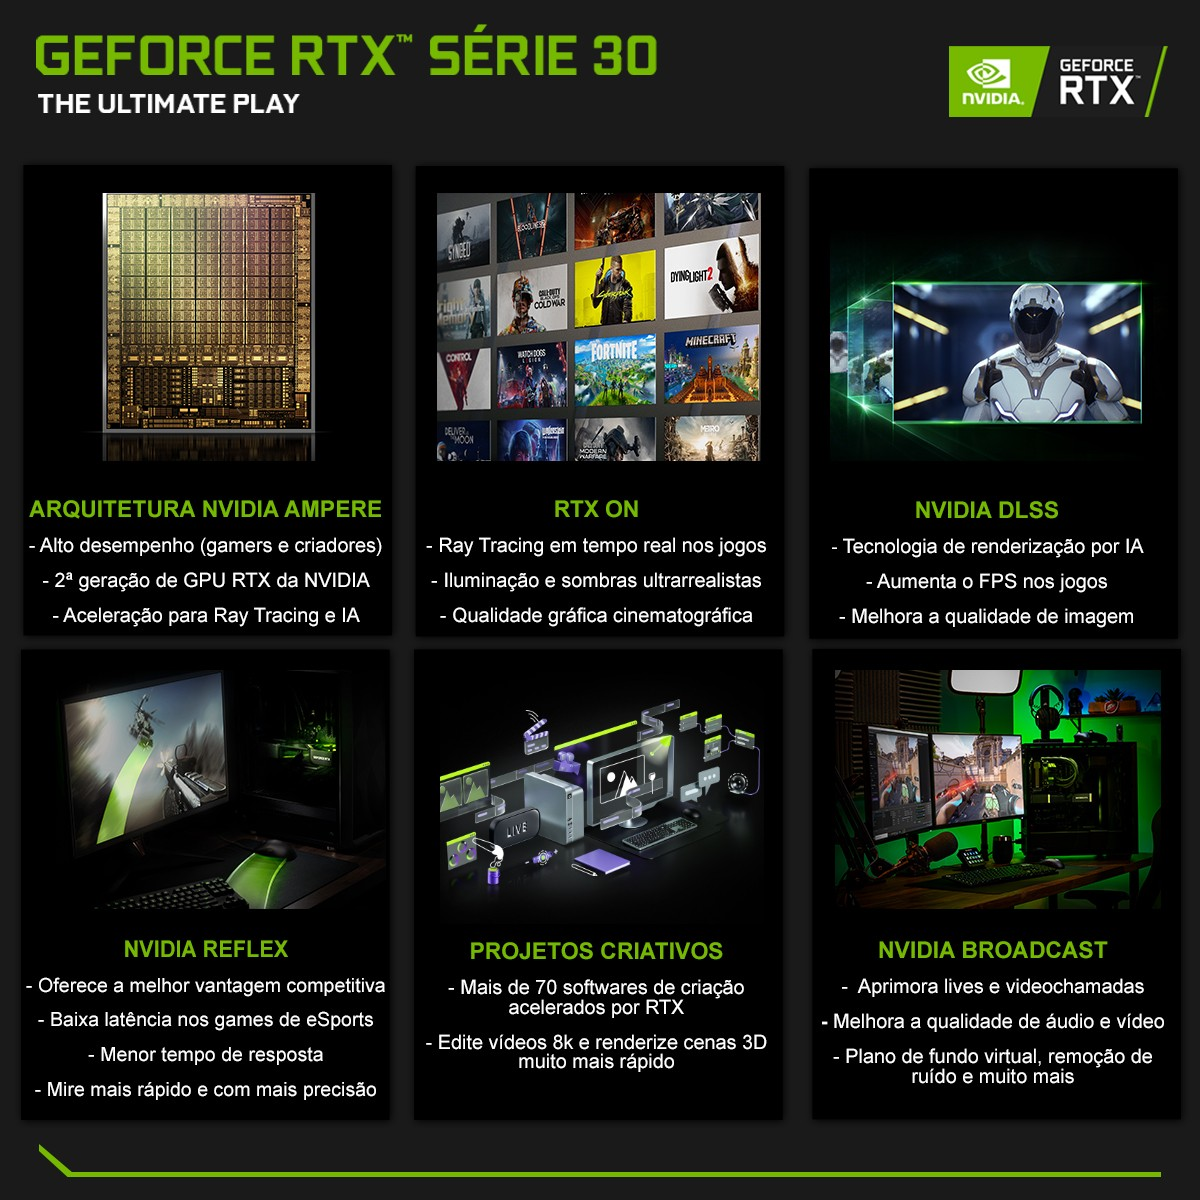 Placa de Vídeo Asus, TUF Gaming, Geforce RTX 3070 Ti, LHR, 8GB, GDDR6X, 256bit, DLSS, Ray Tracing, 90YV0GY1-M0NA00